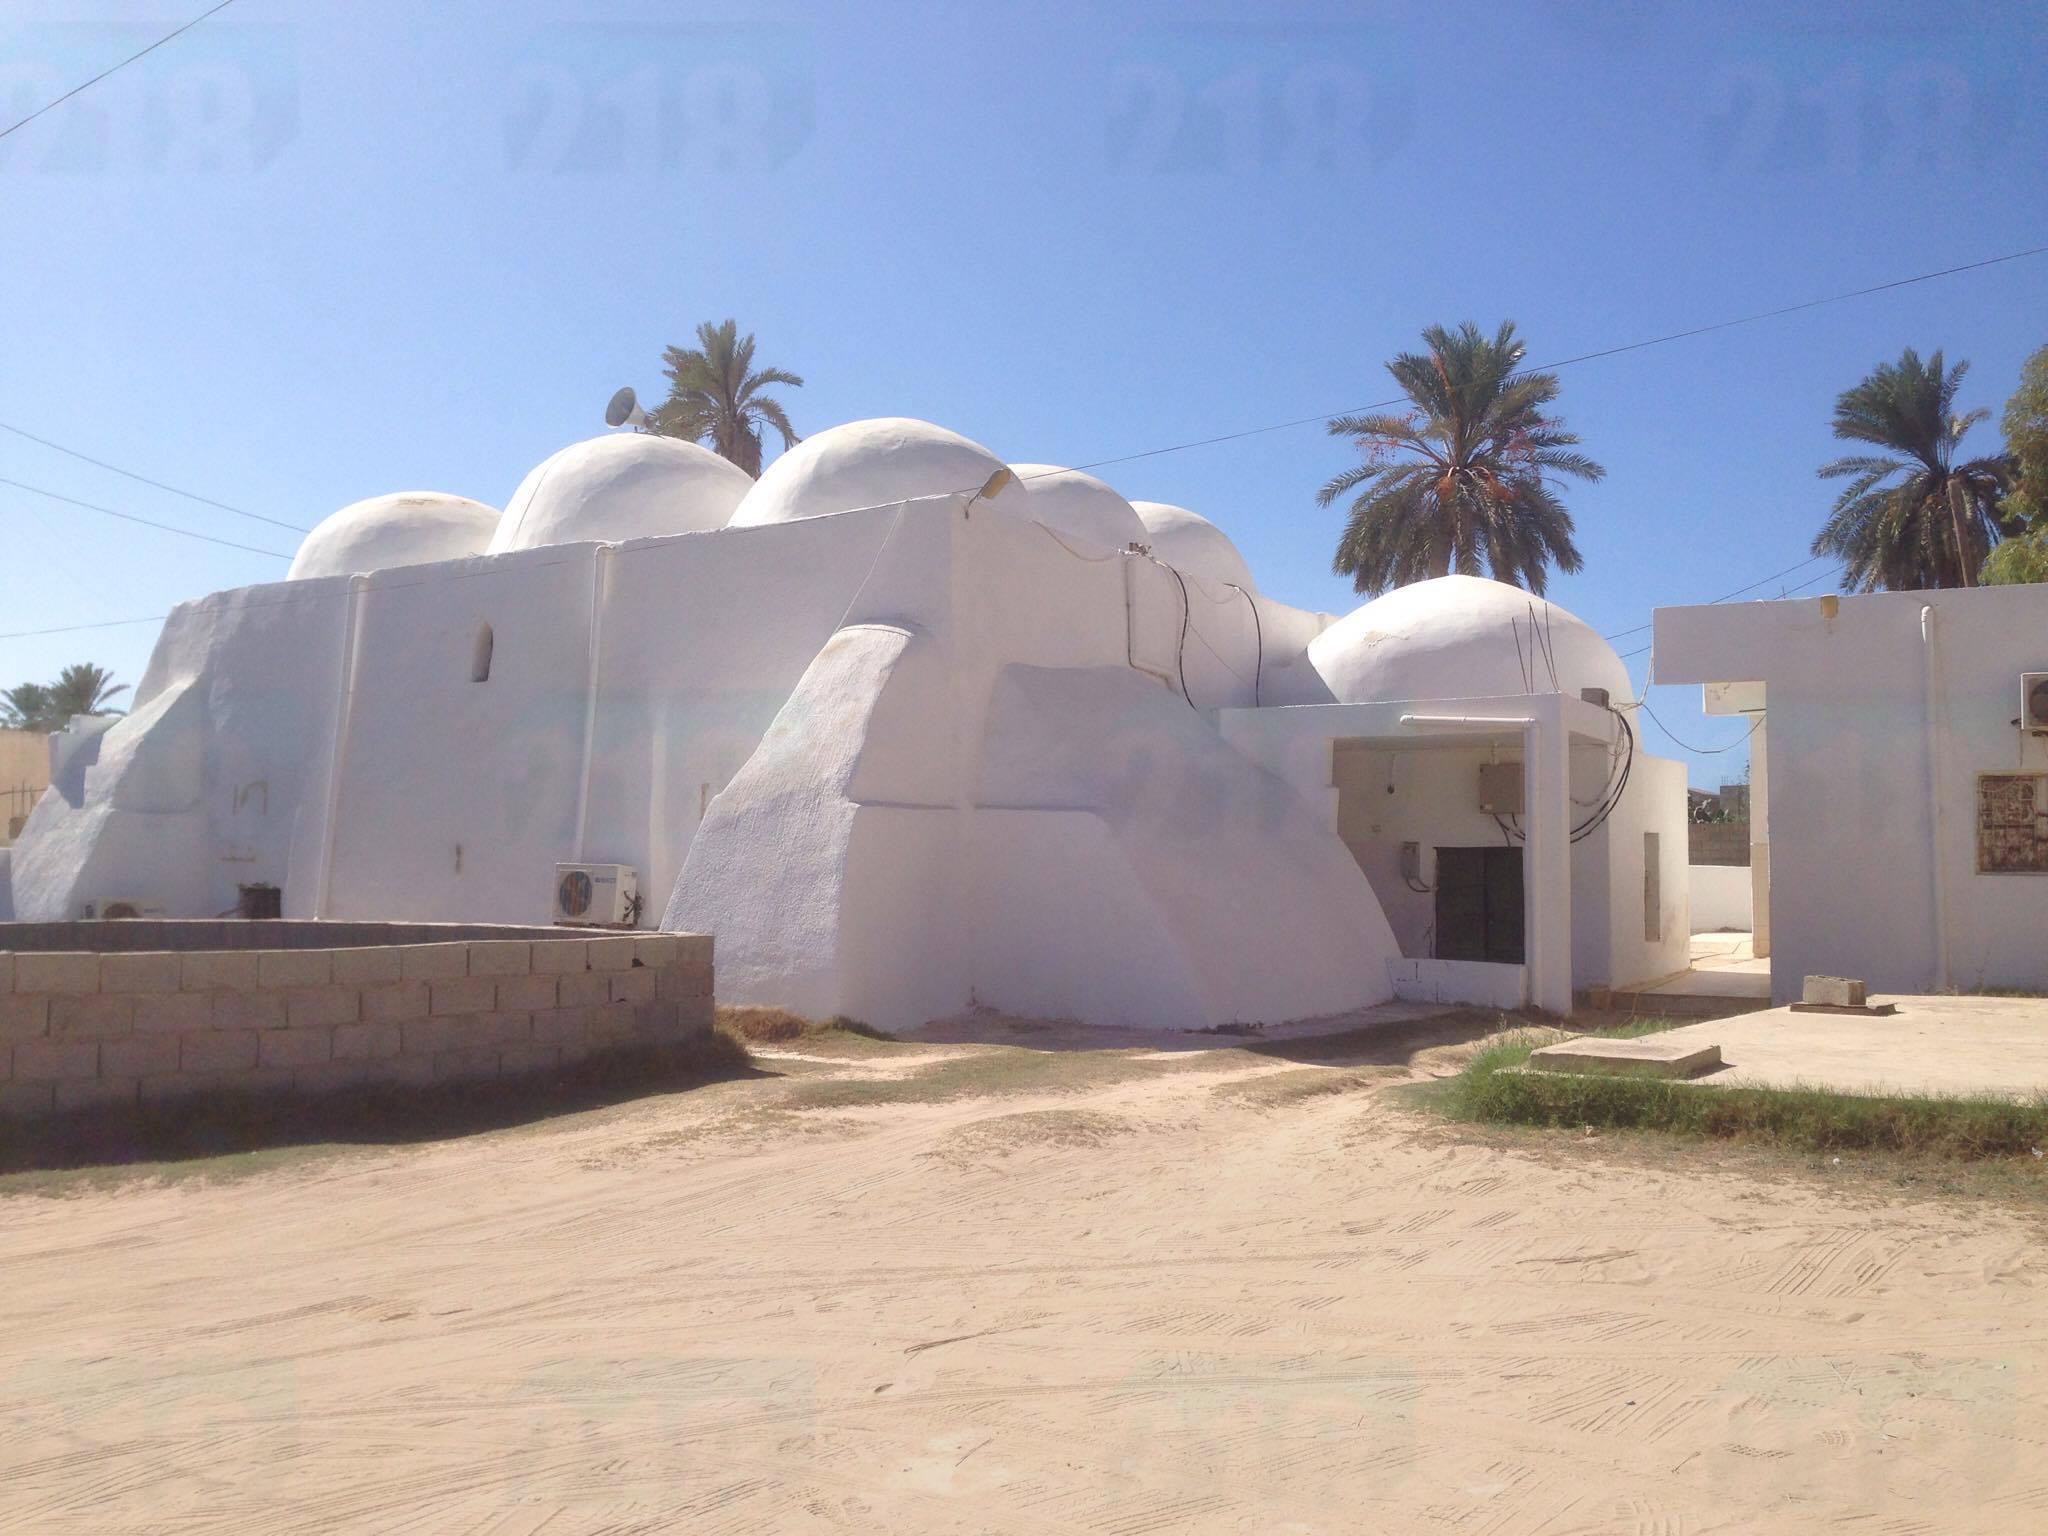 Photo of مسجد بن غلبون.. تاريخ 800 عام لا يُحرك المسؤولين